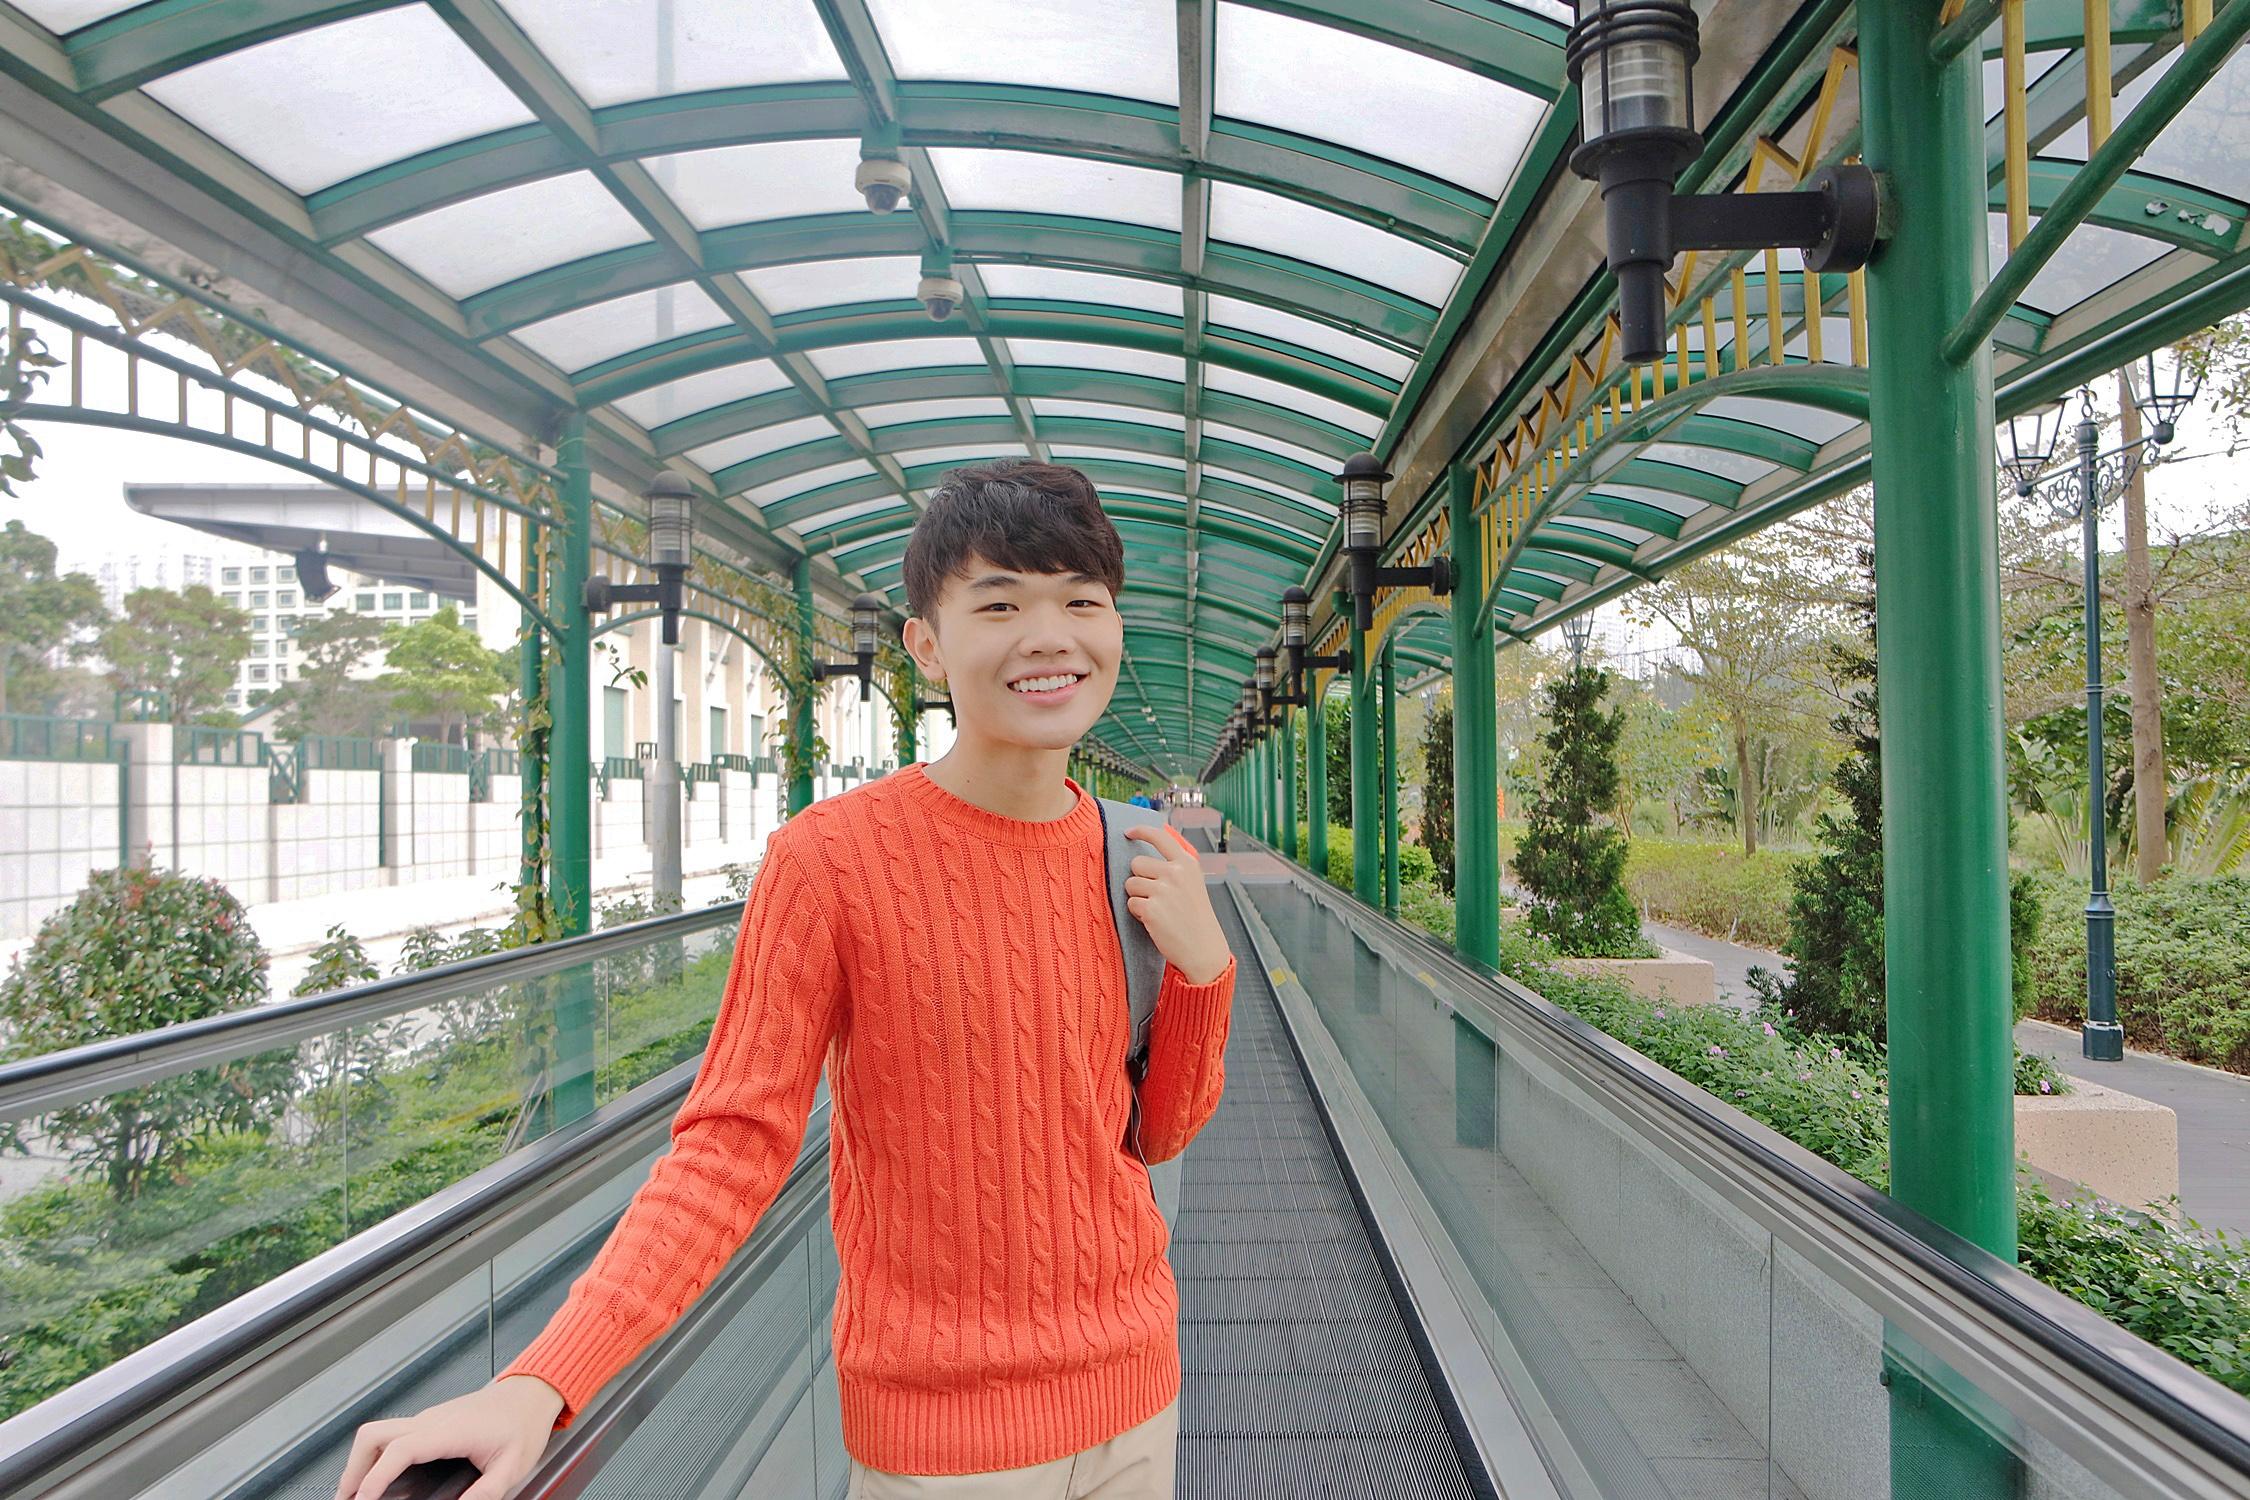 Walkway Travelator from The Venetian to Old Taipa Village